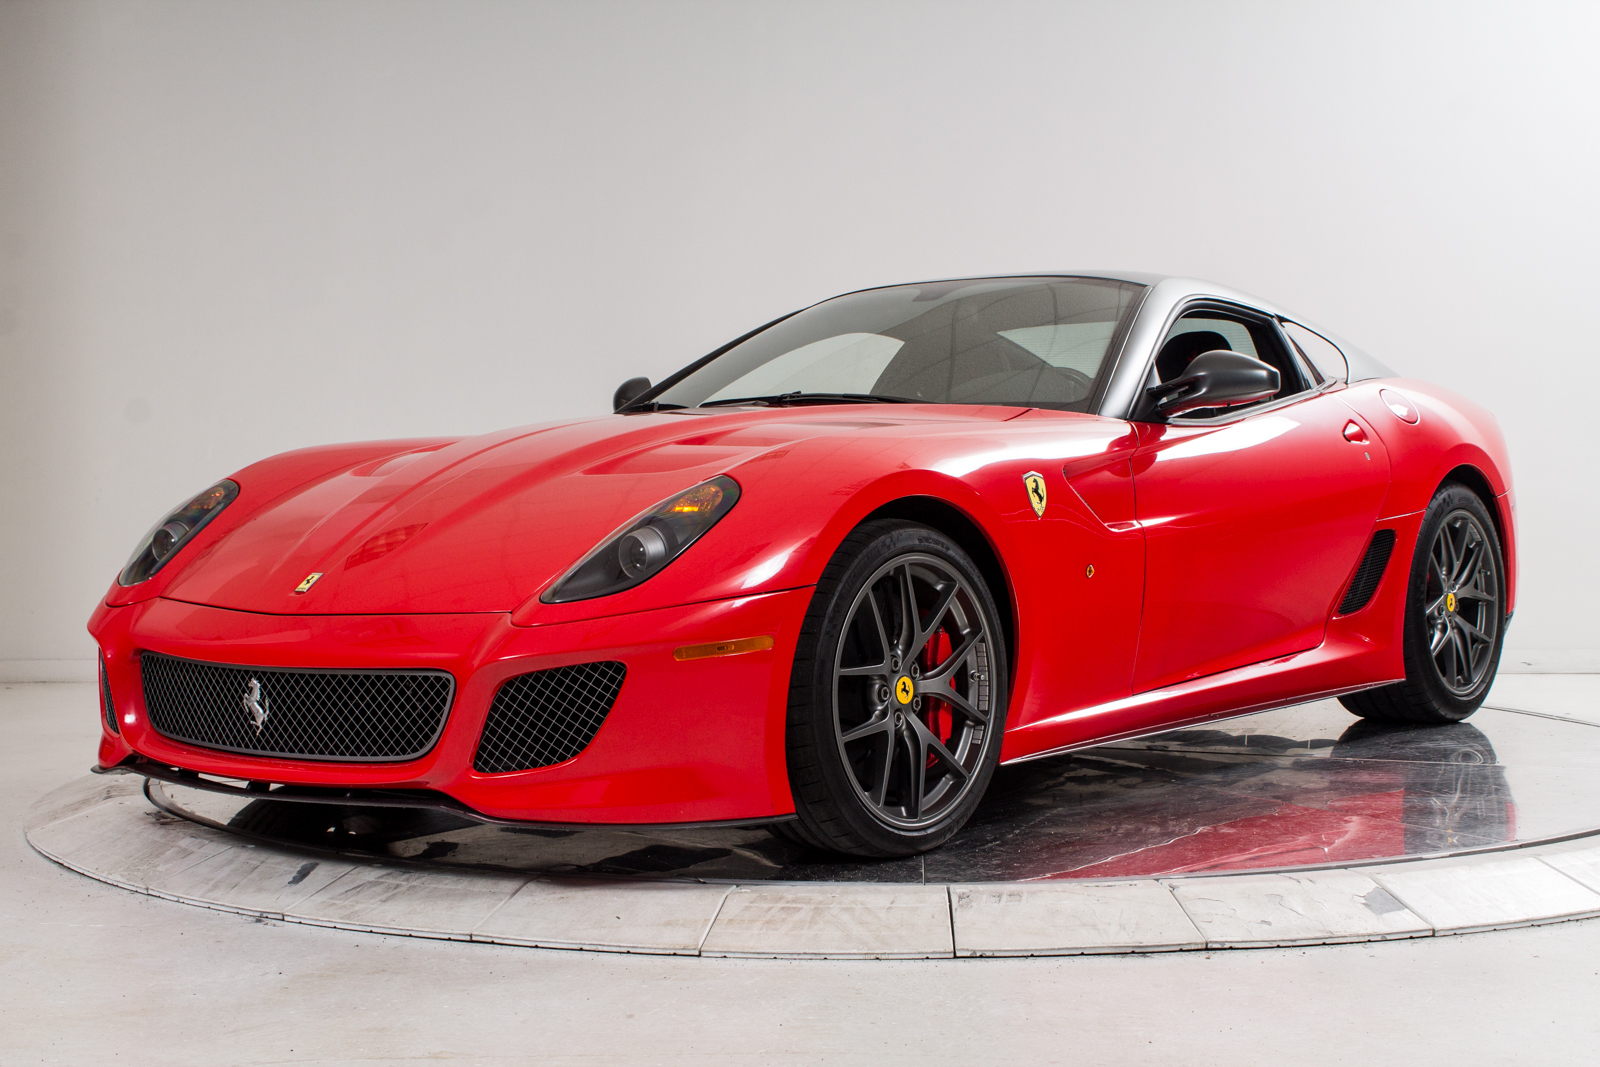 Glamorous Ferrari 599 Gto For Sale In The U S Gtspirit